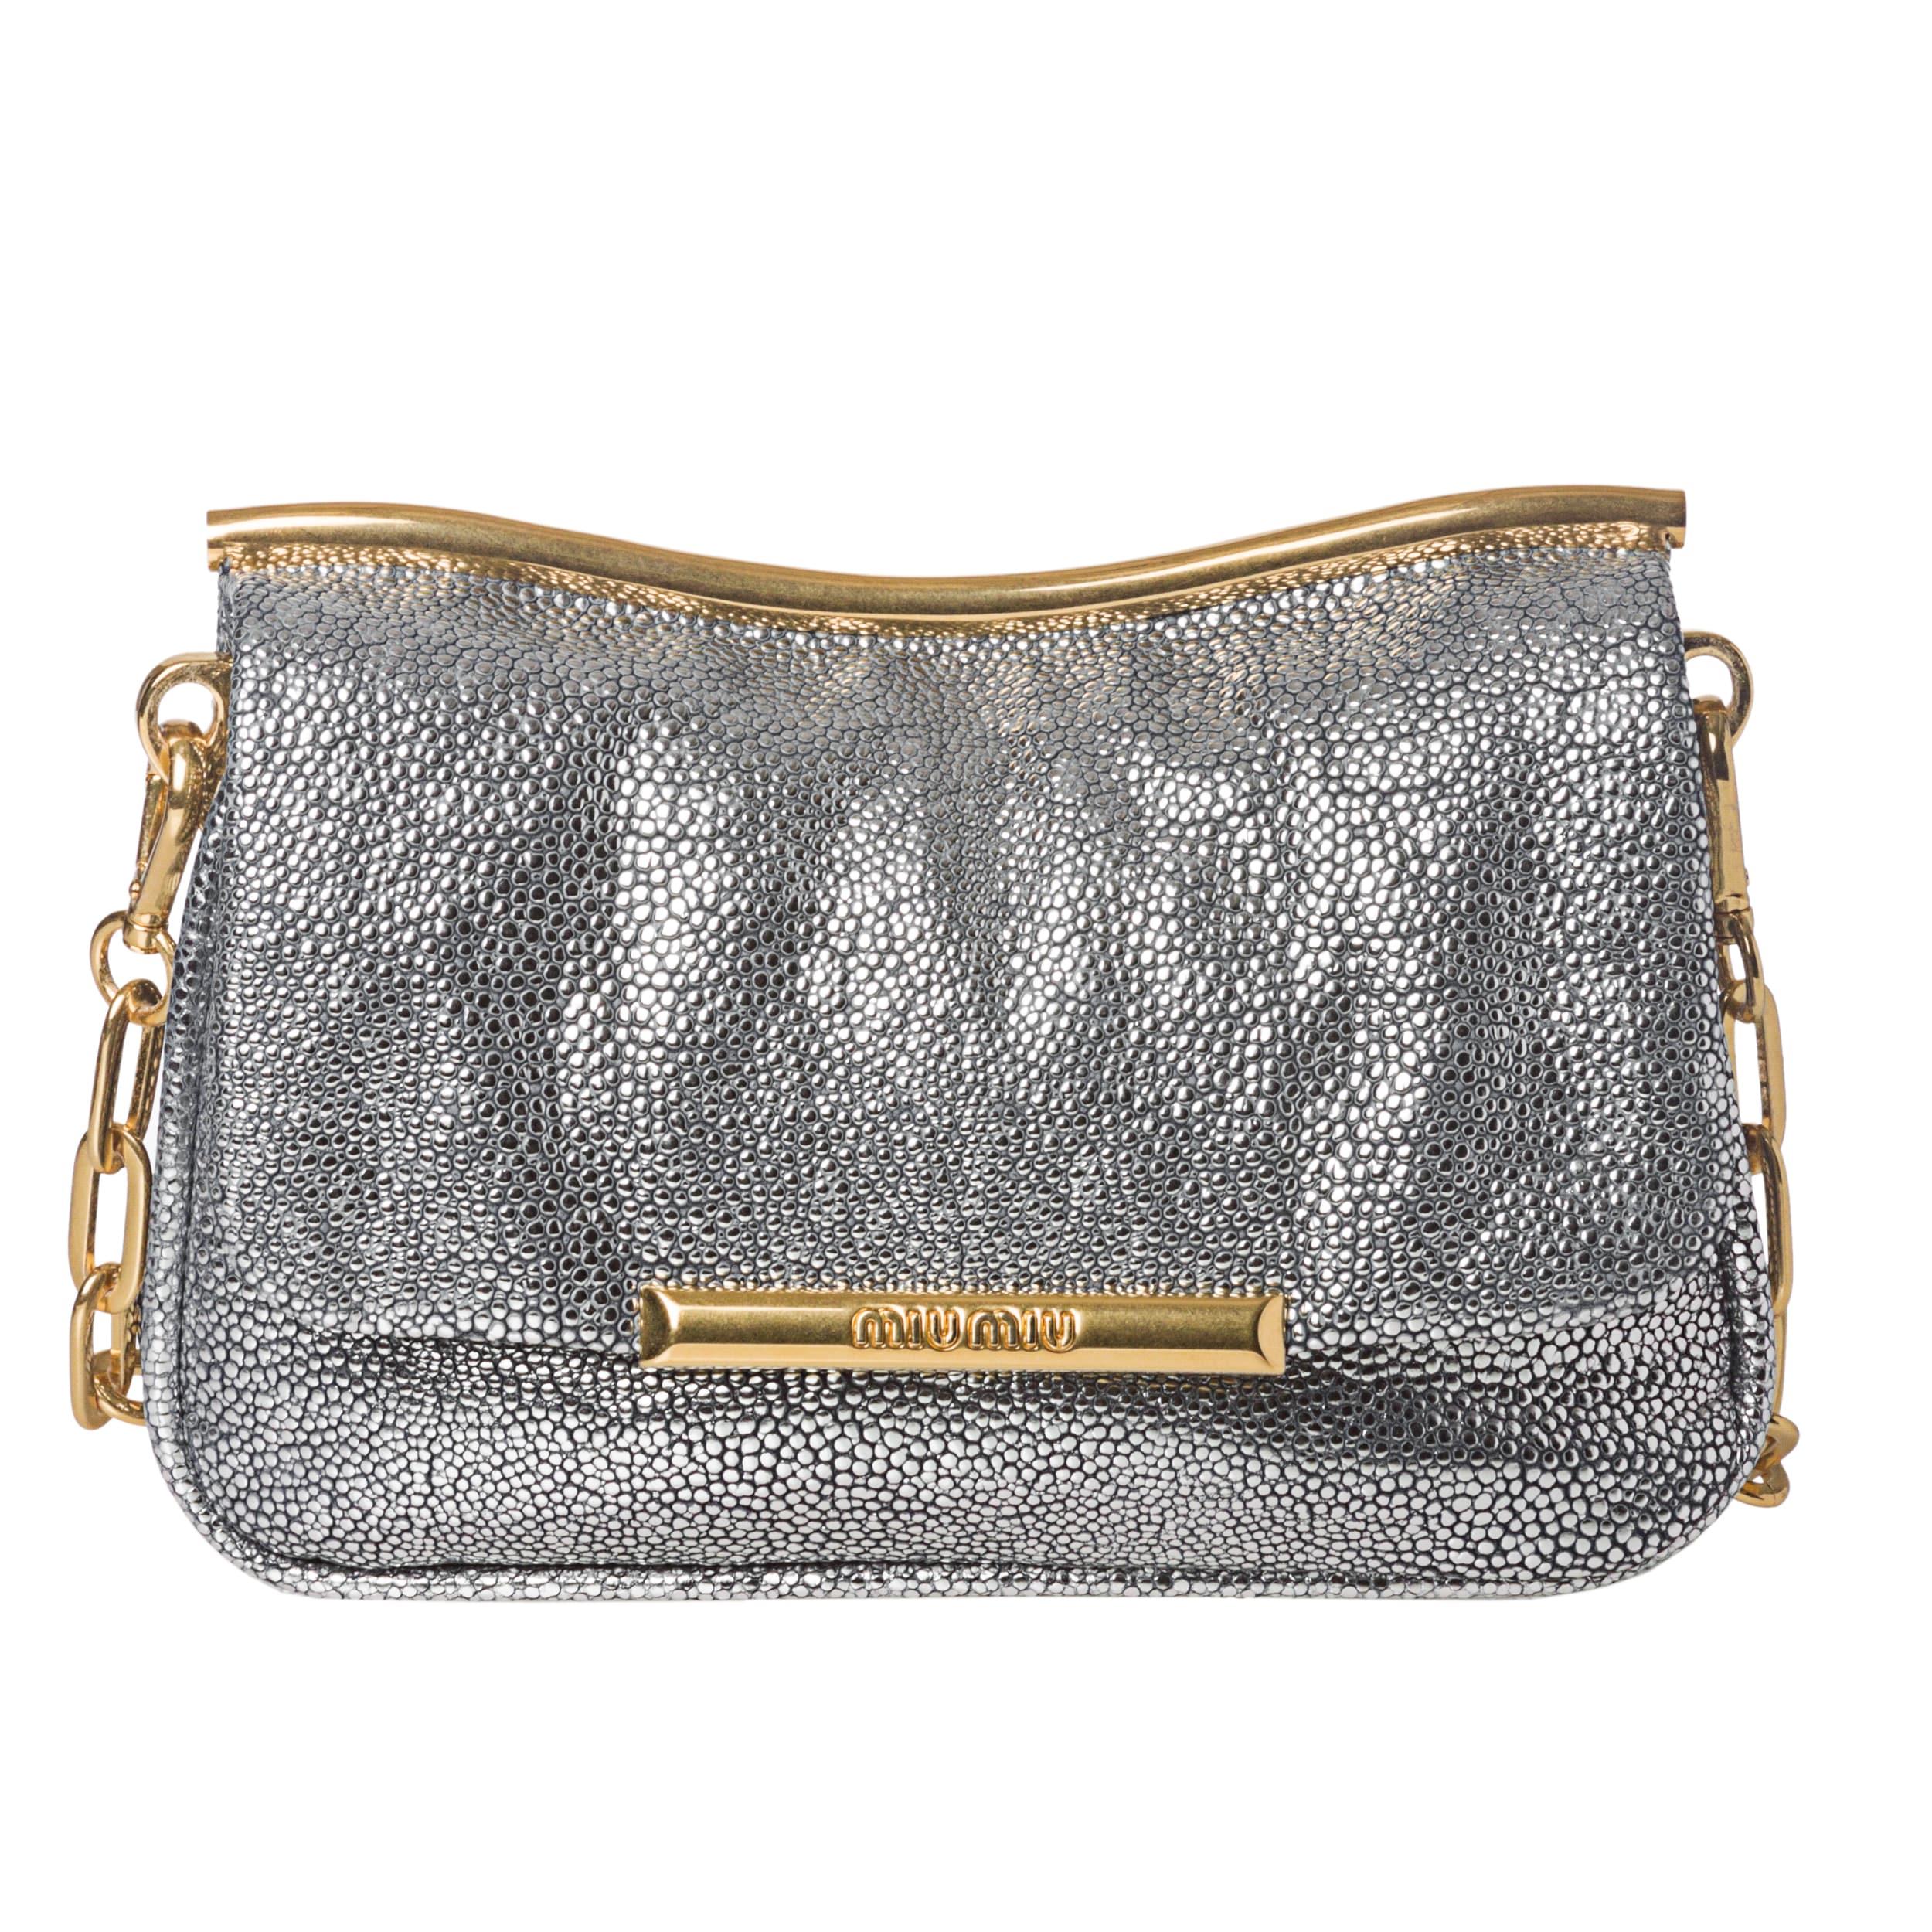 Miu Miu Silver Embossed Leather Crossbody Bag